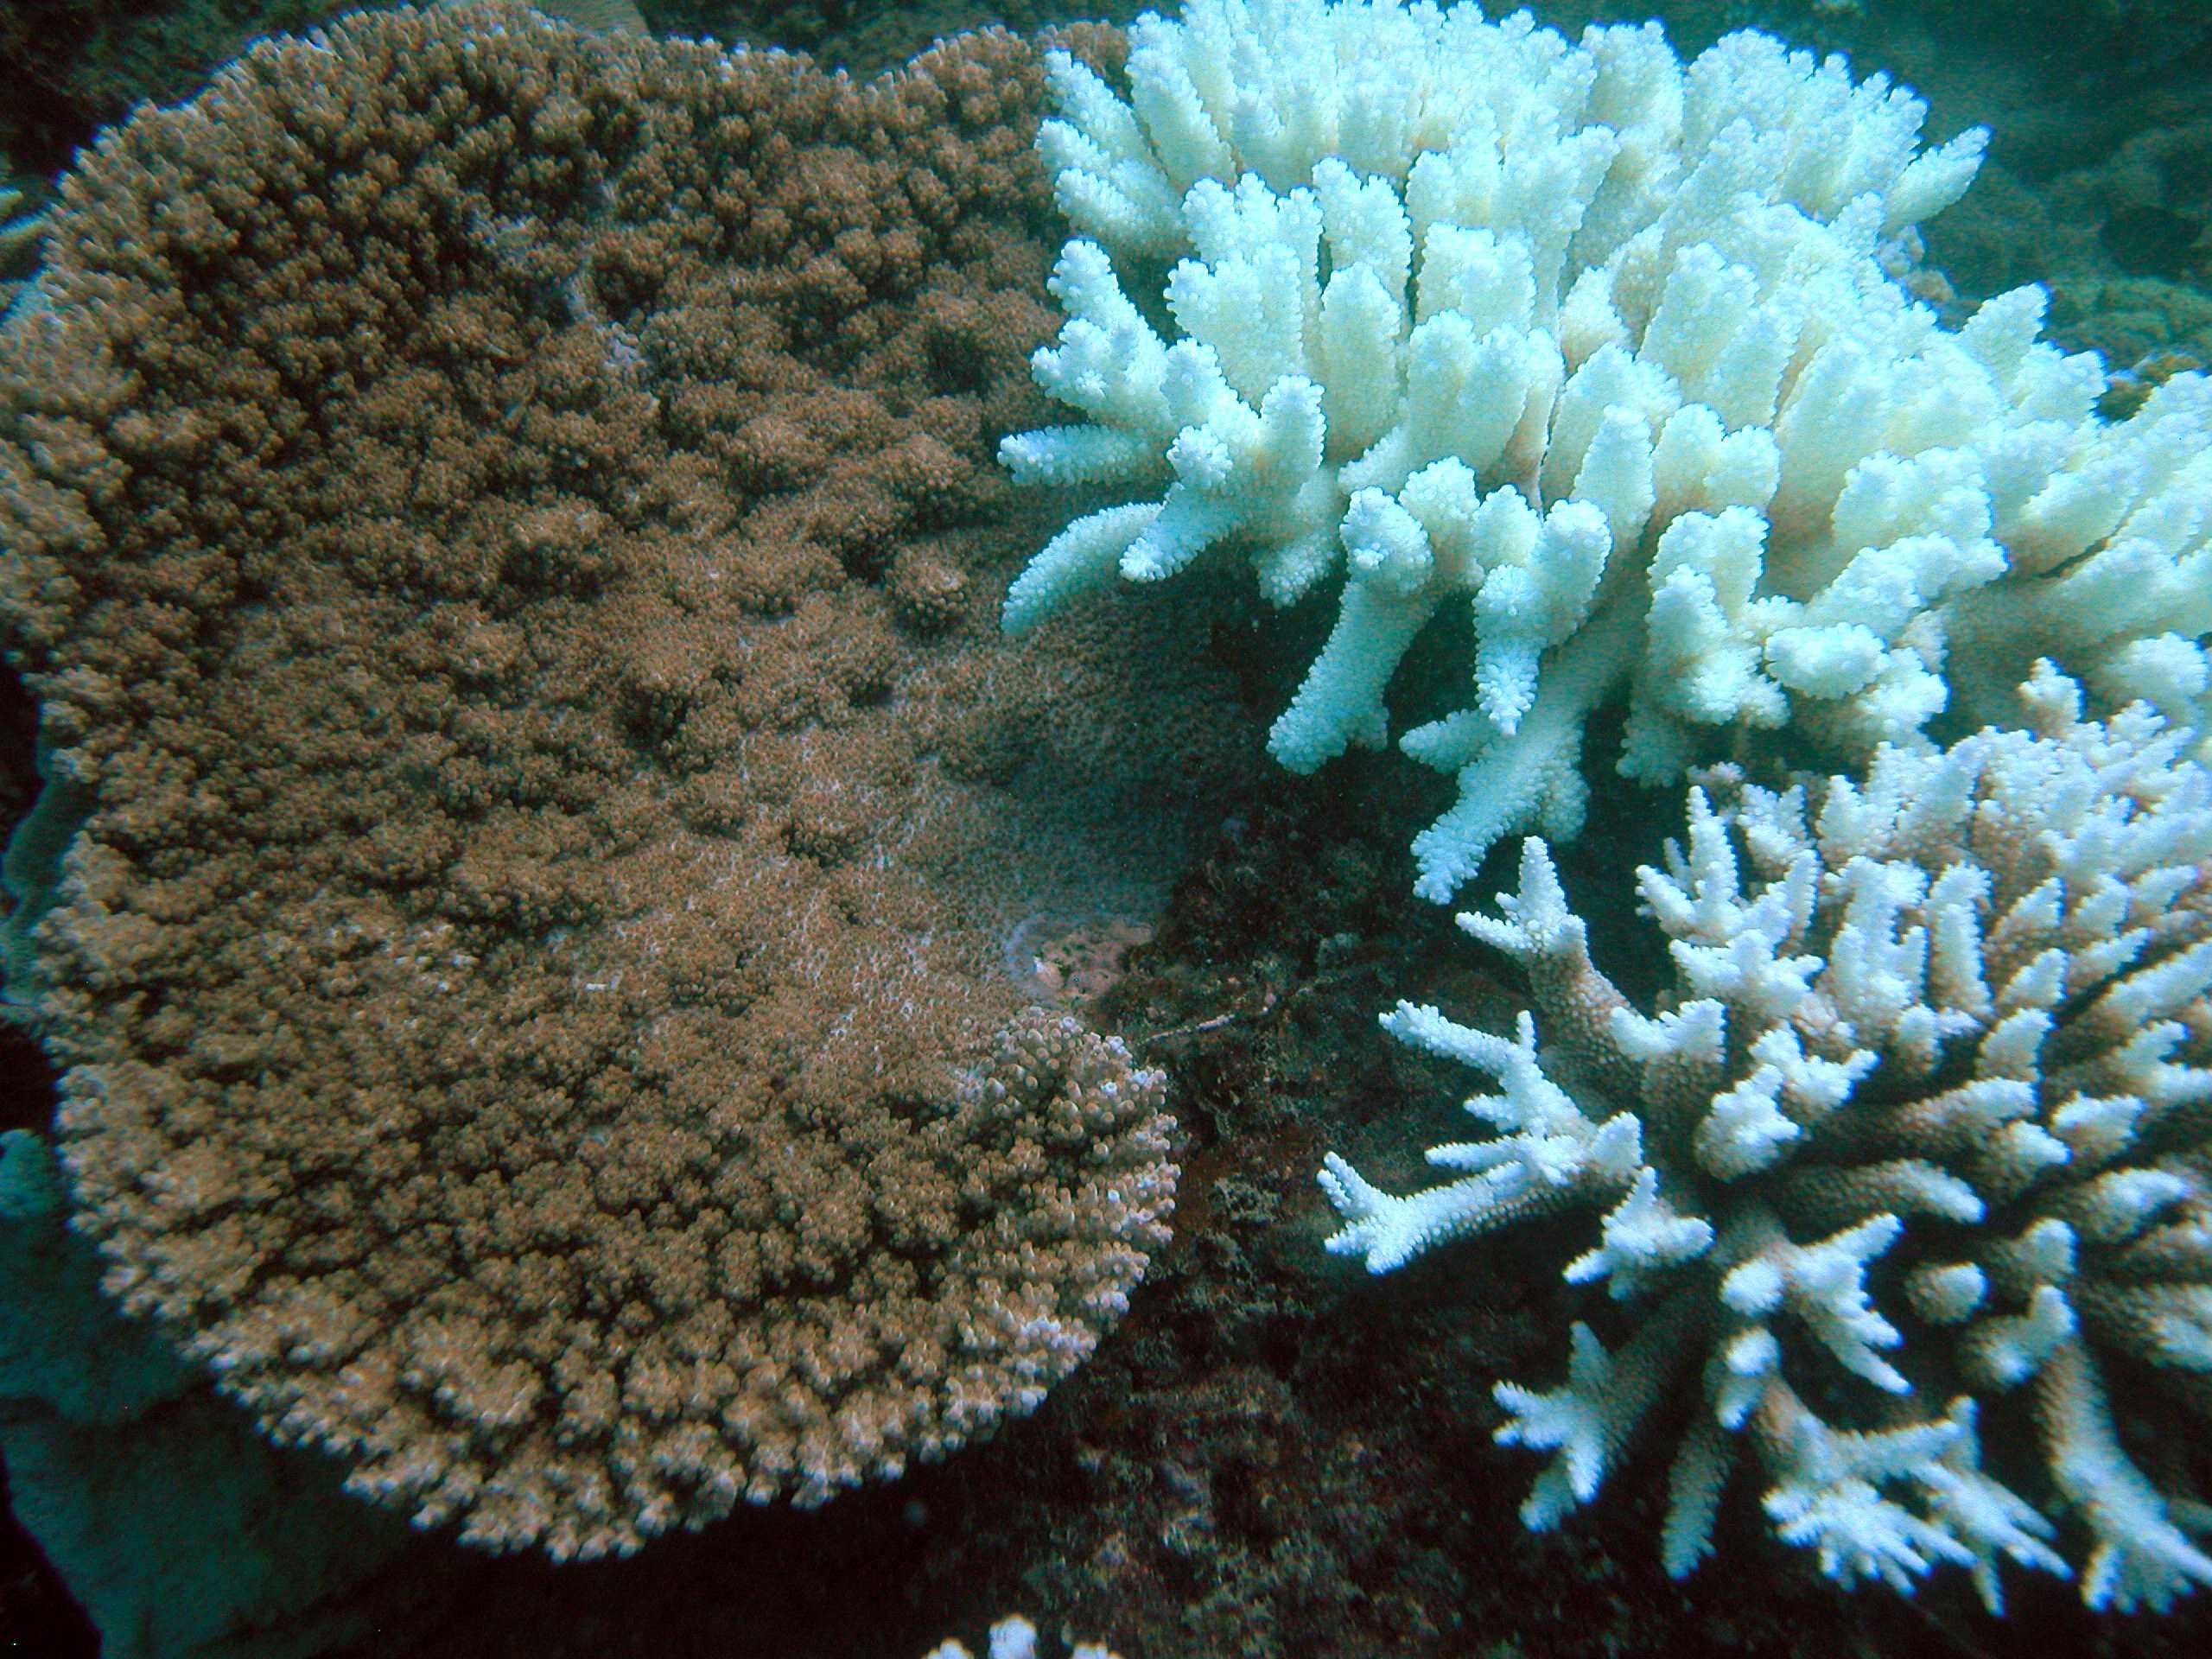 symbiotic relationship of coral and algae